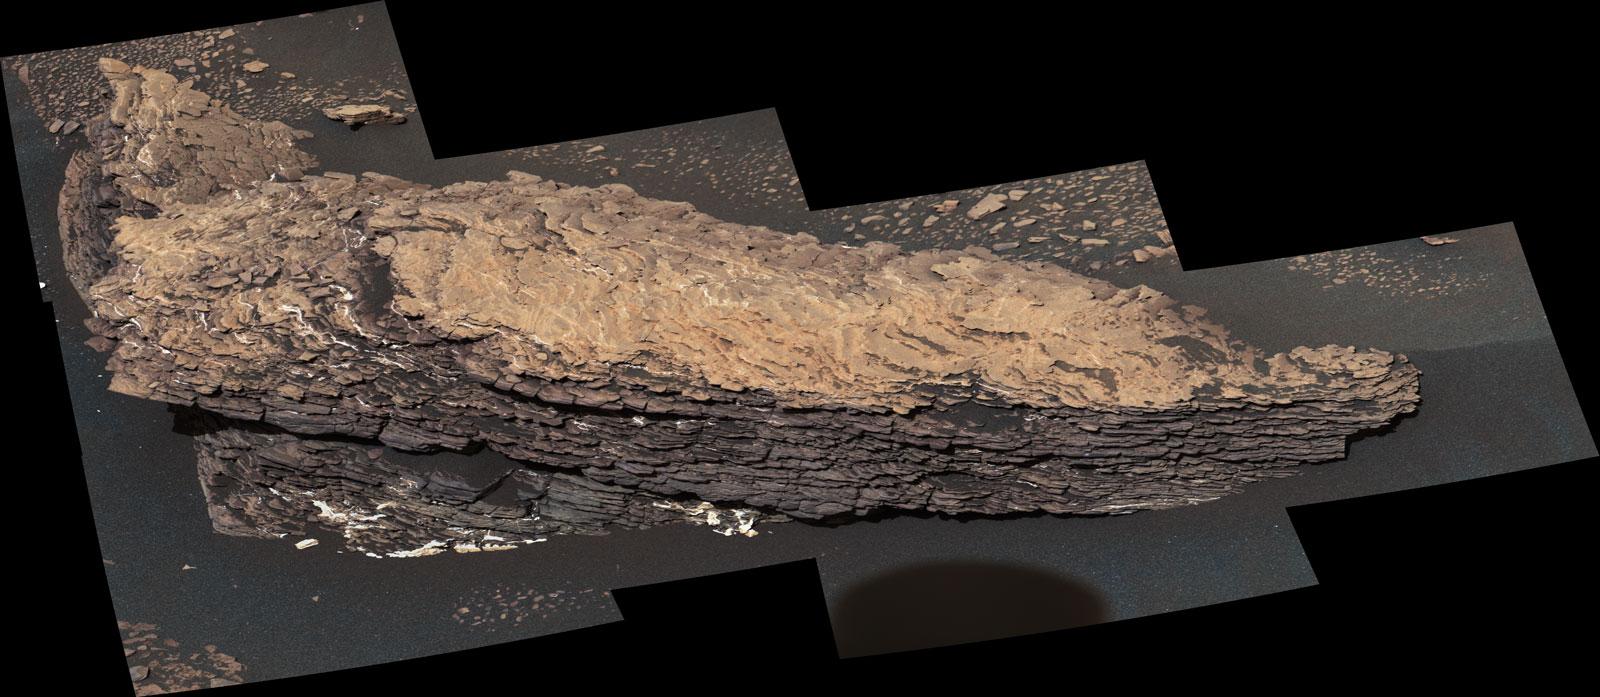 Planeta Marte. INTREAGA Lume ULUITA de Noua Imagine a NASA roca